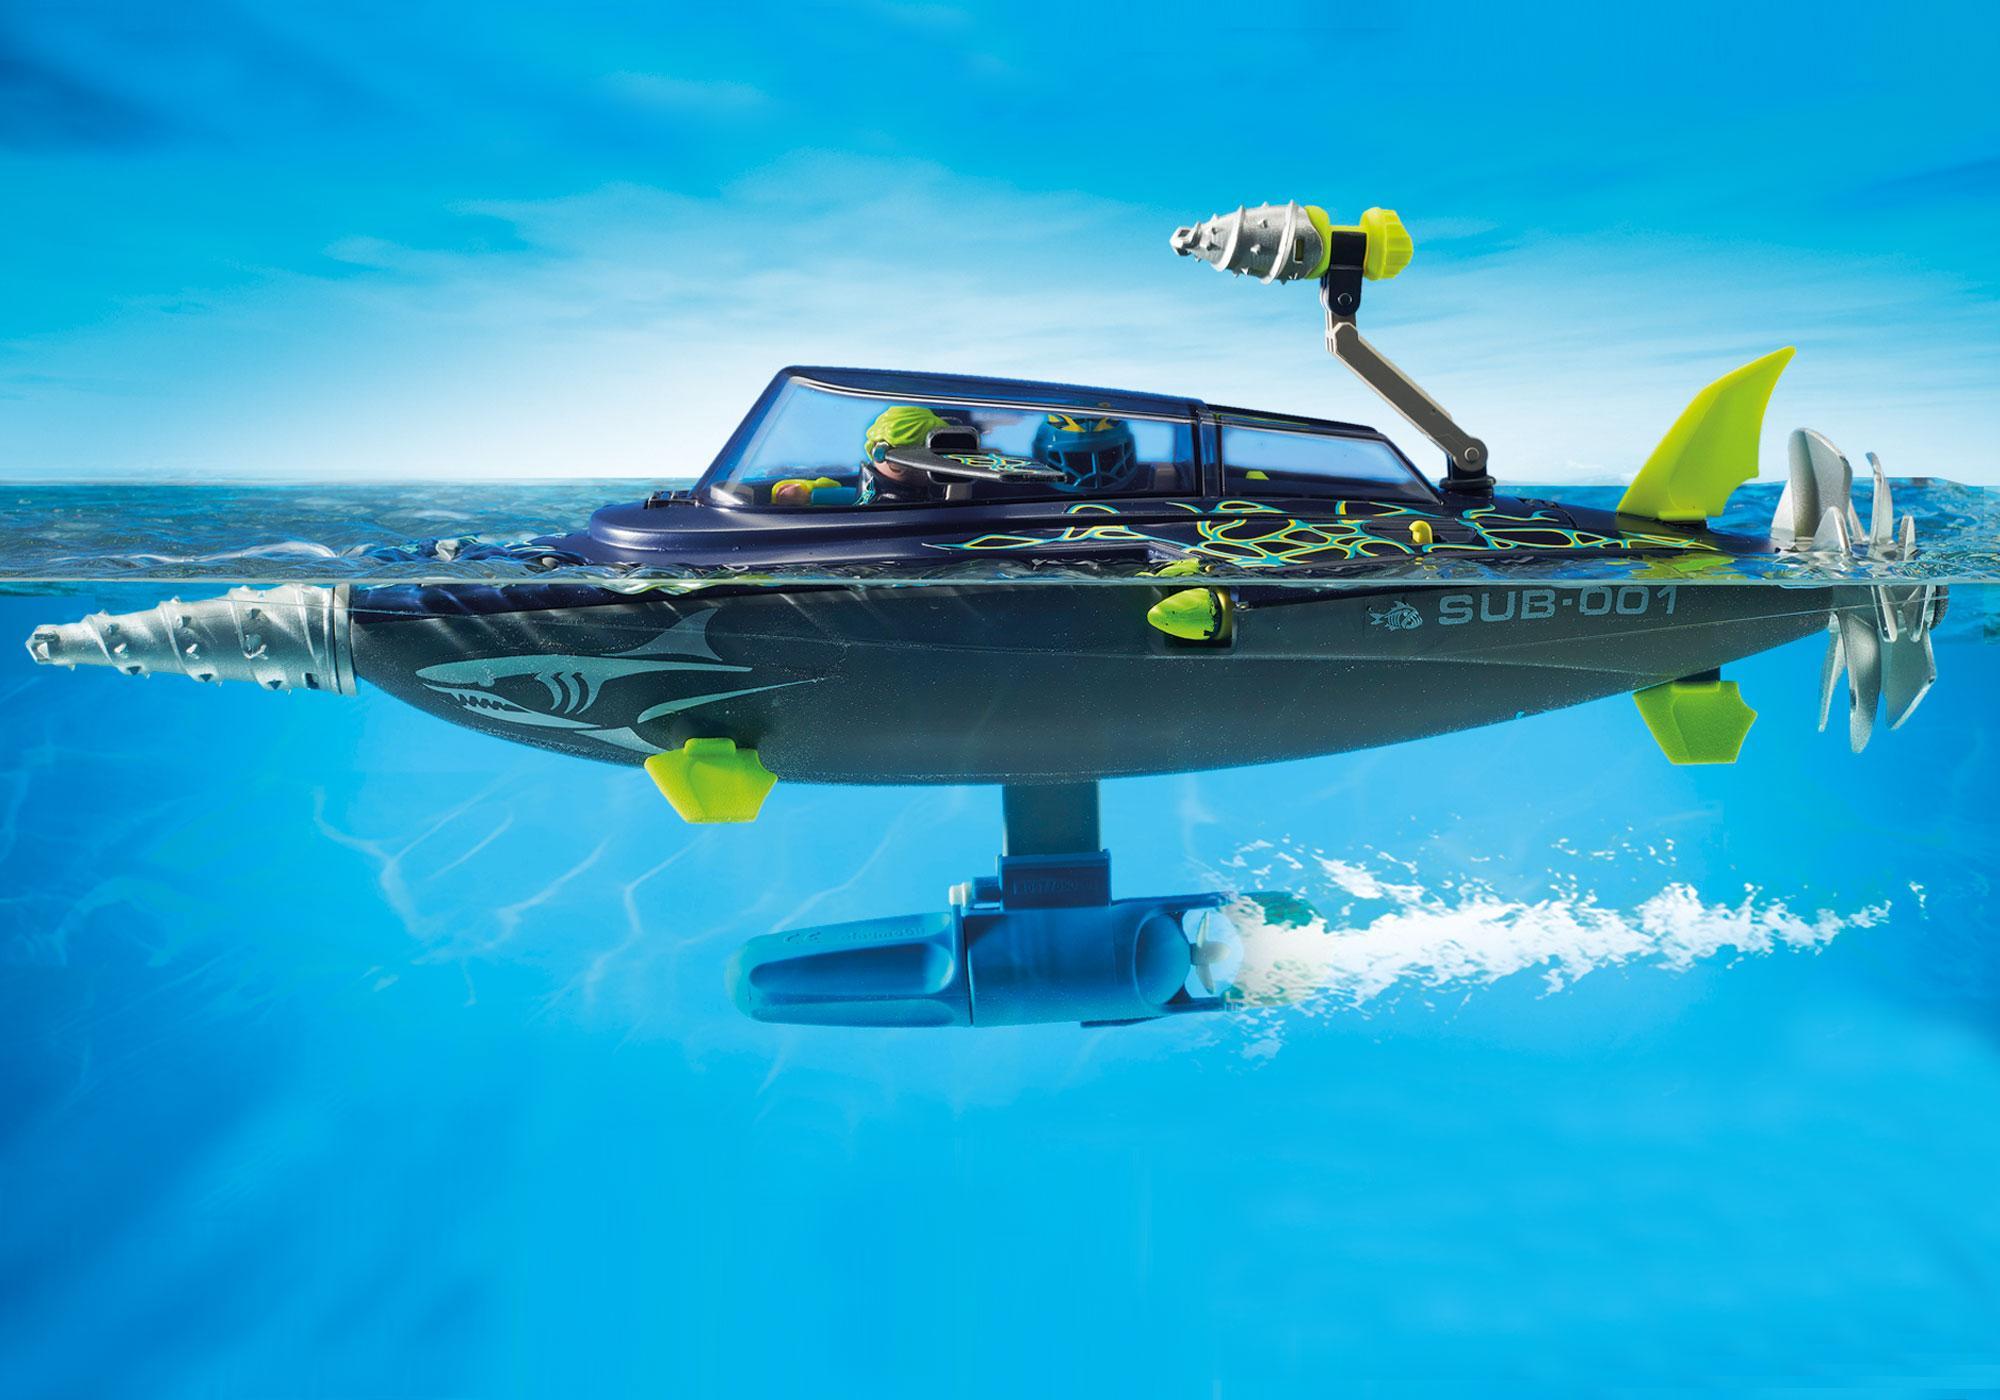 http://media.playmobil.com/i/playmobil/70005_product_extra2/TEAM S.H.A.R.K. Destroyer med bor